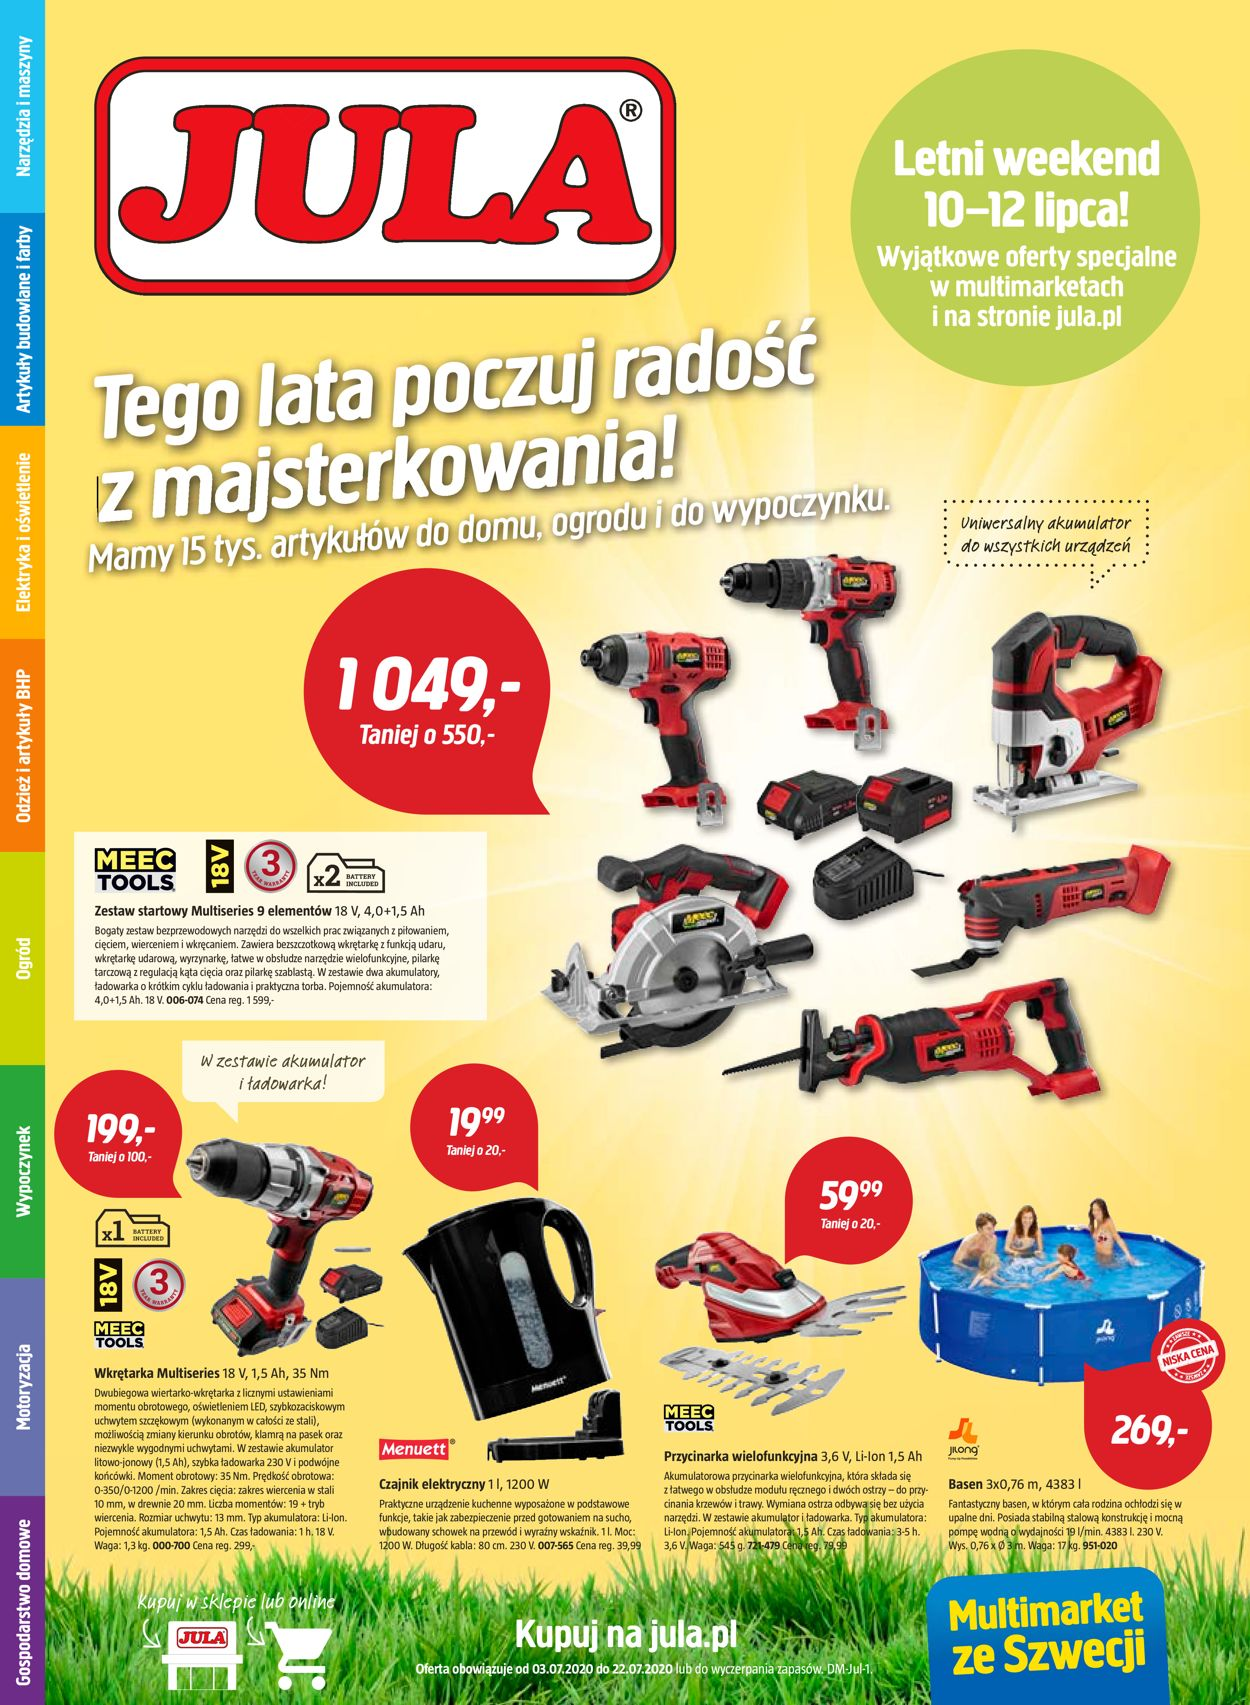 Gazetka promocyjna Jula - 03.07-22.07.2020